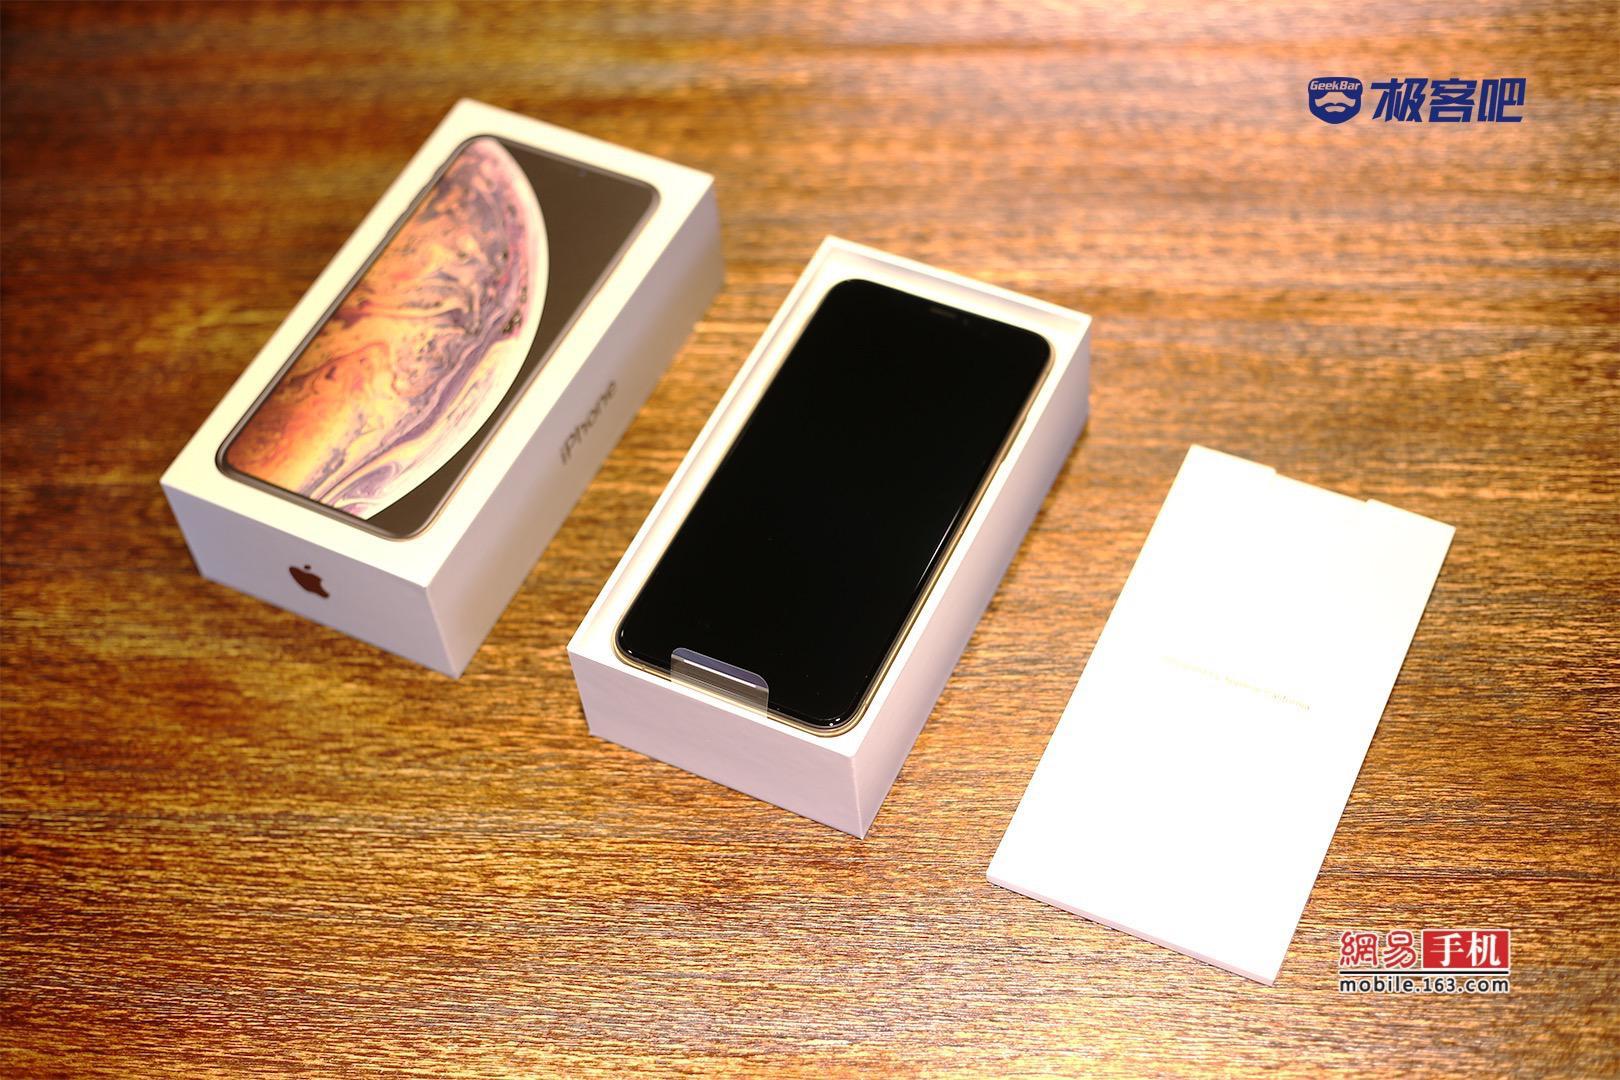 iPhone XS Max详细拆解:做工精湛/双卡有玄机